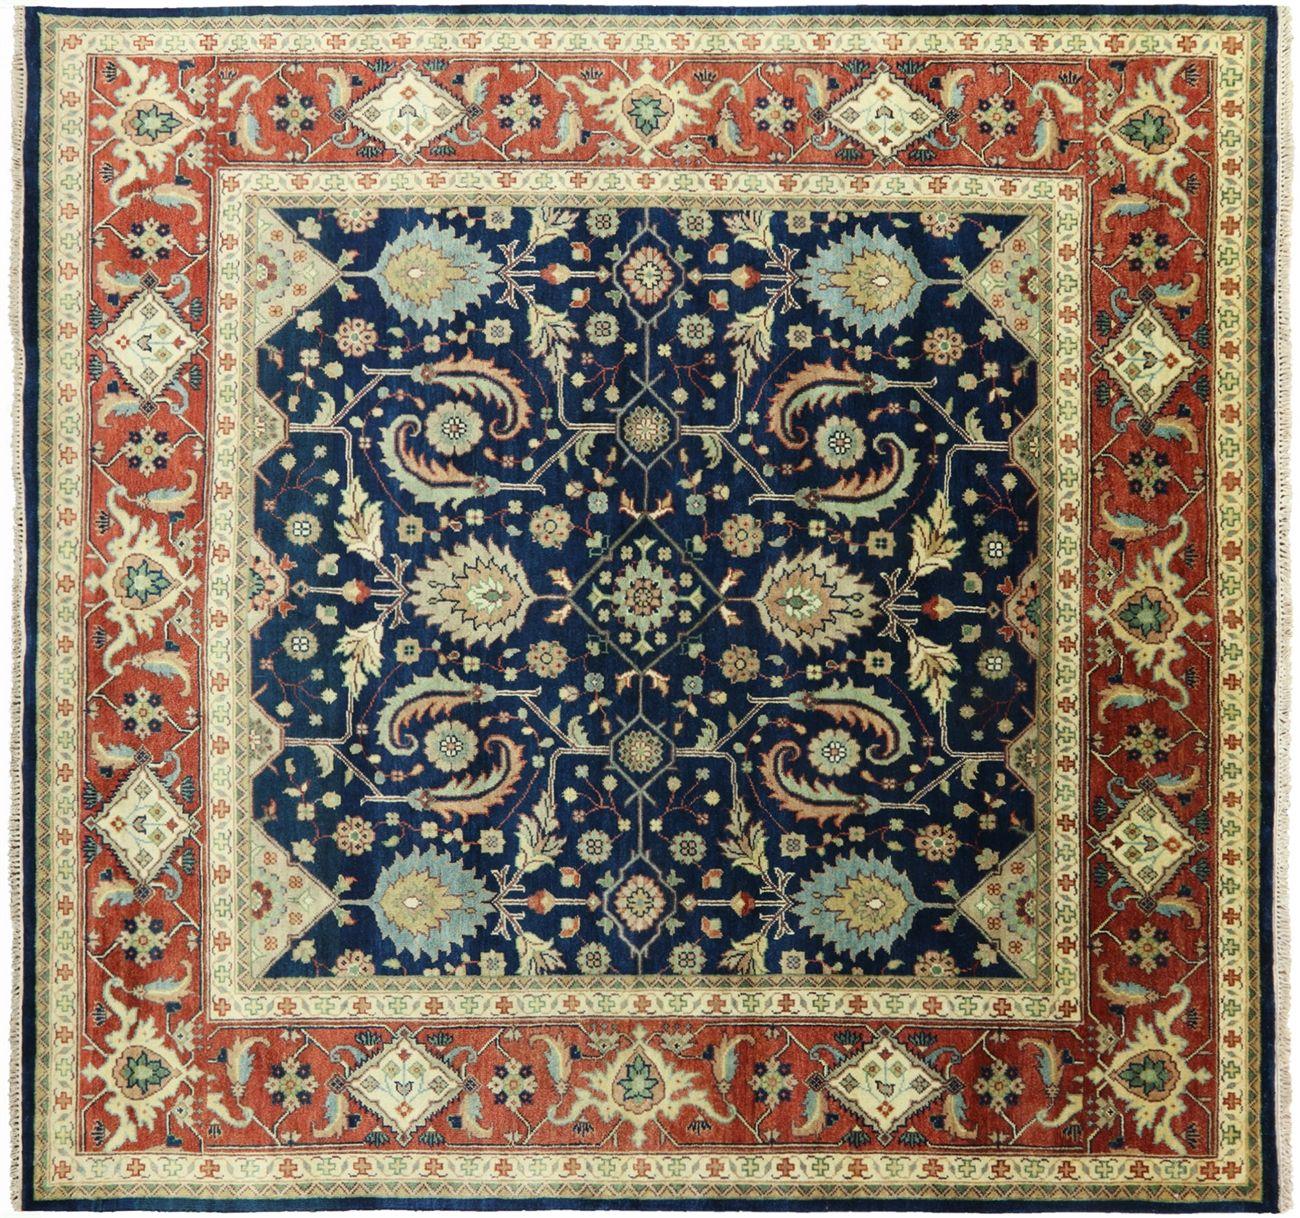 8 Square Heriz Serapi Handmade Wool Area Rug Q1053 Rugs Wool Area Rugs Rugs On Carpet